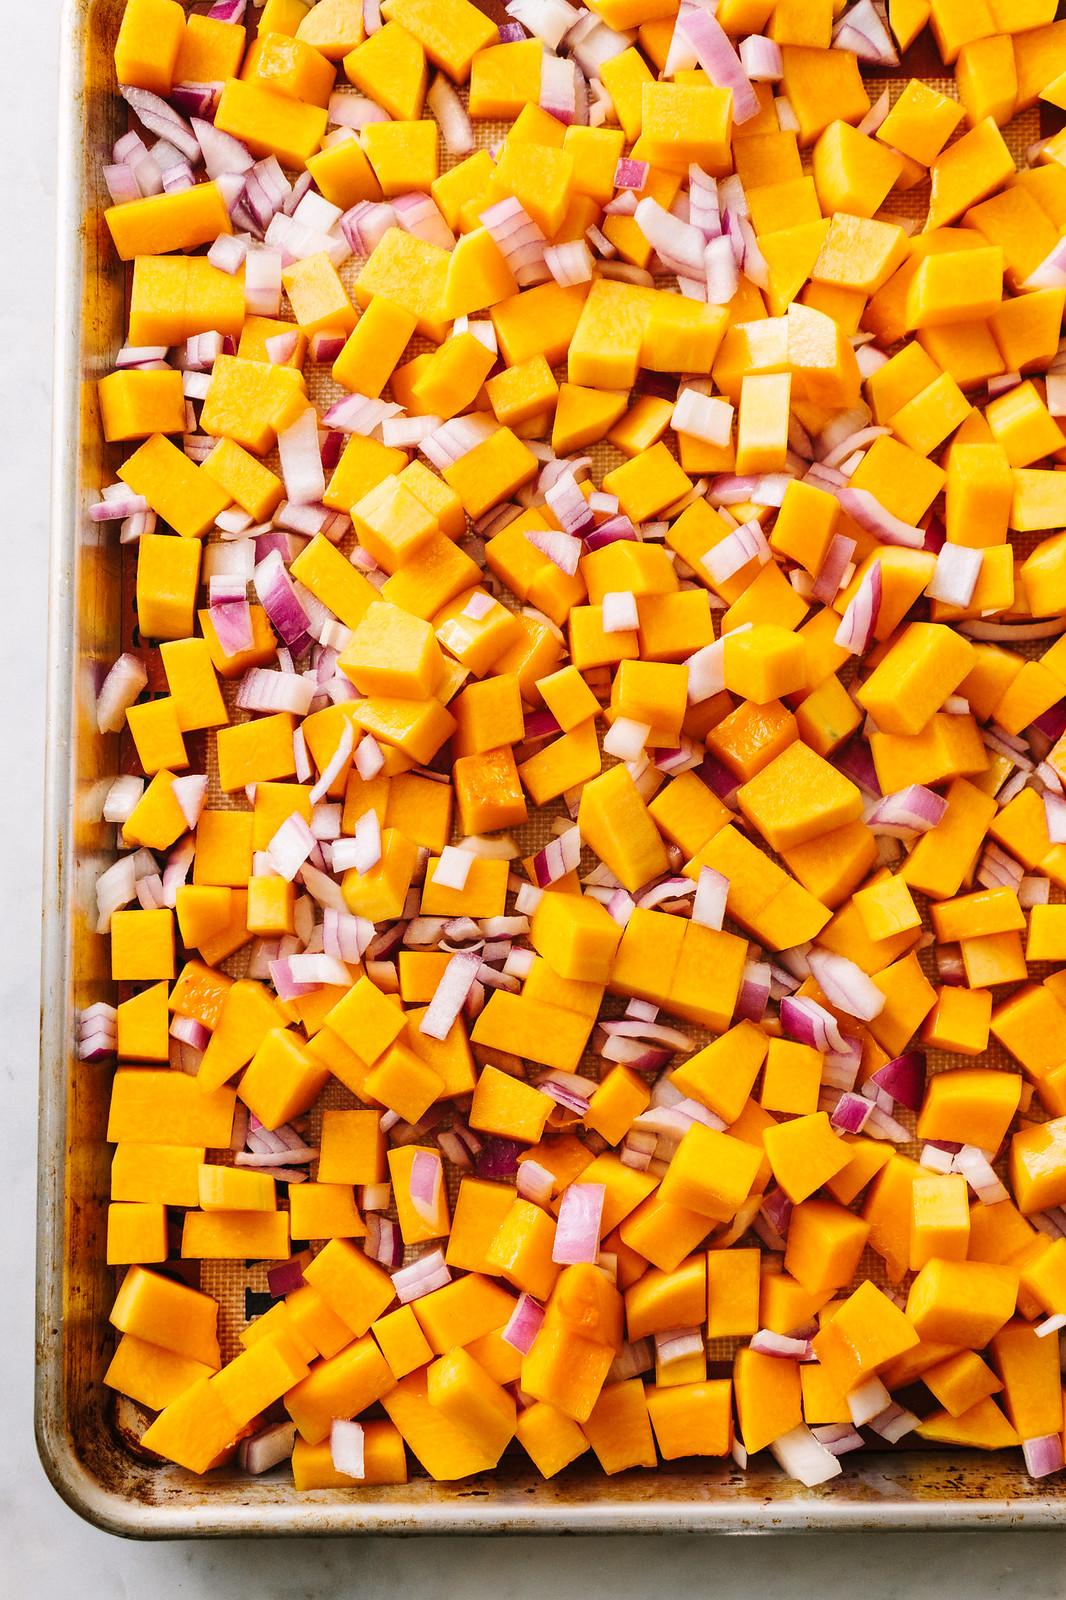 AUTUMN BUTTERNUT SQUASH QUINOA SALAD: Butternut squash and onion on sheet pan